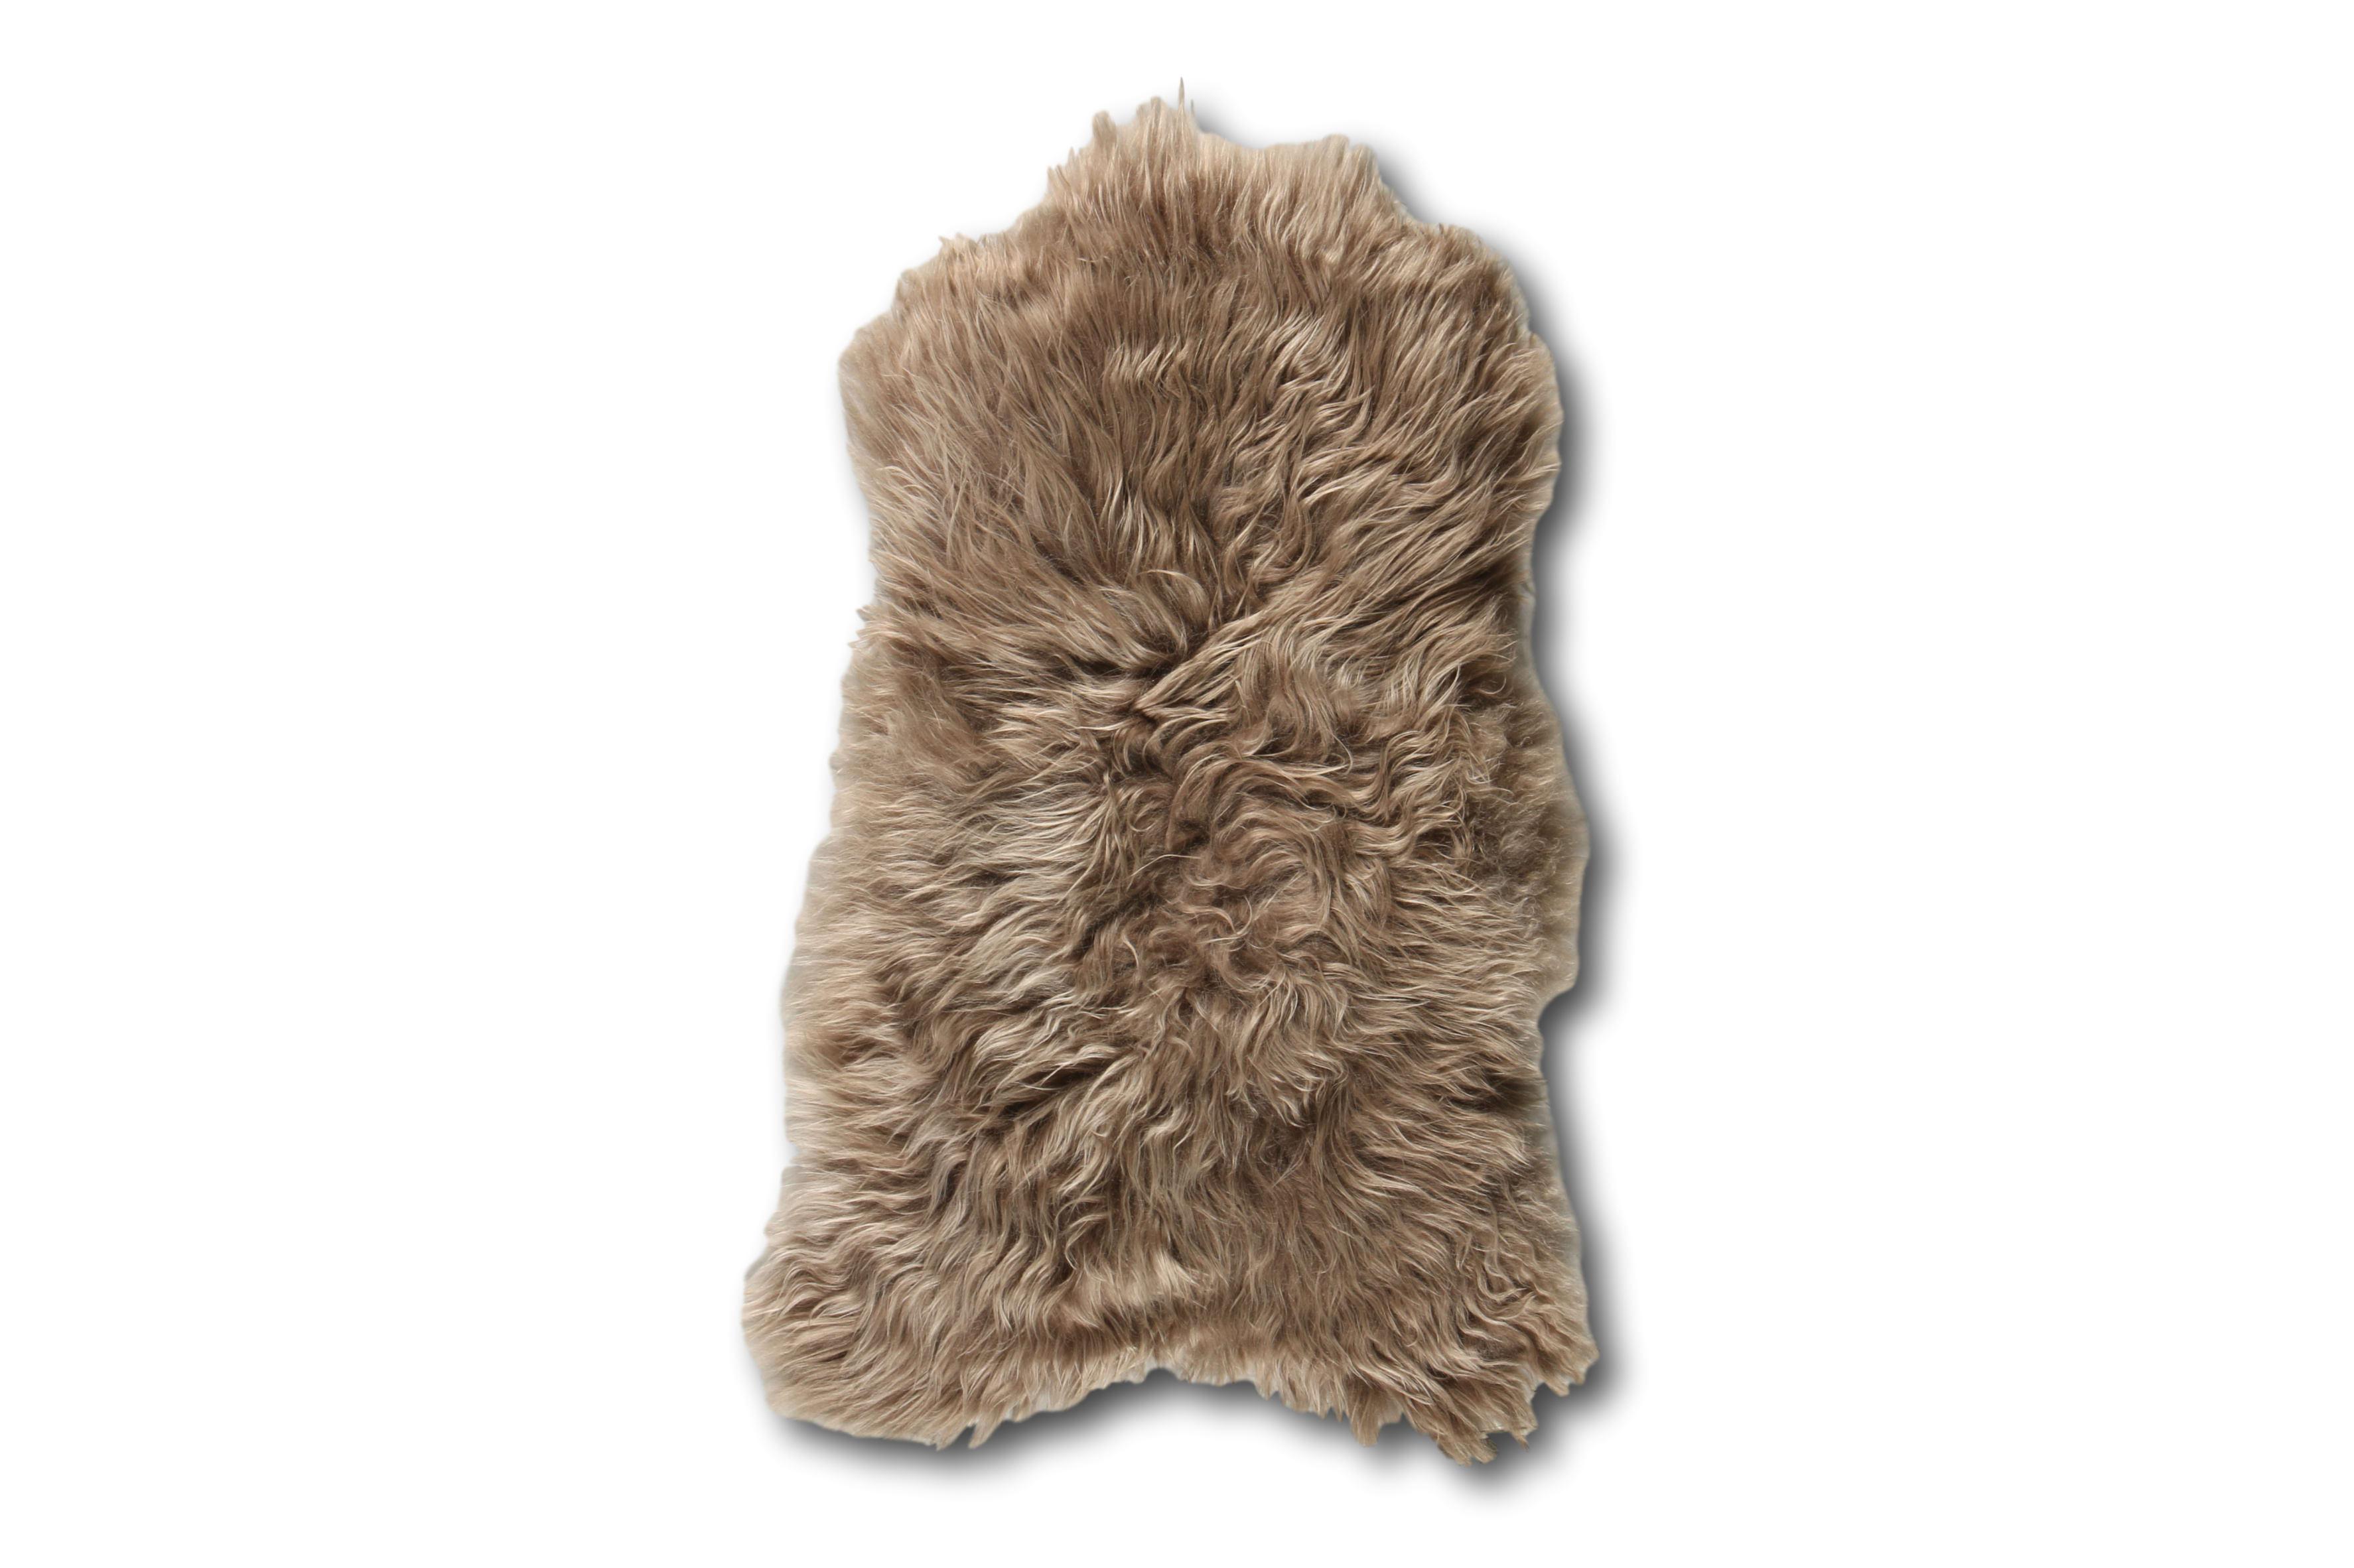 Esbeco Tapis en peau de mouton islandais taupe 90x60